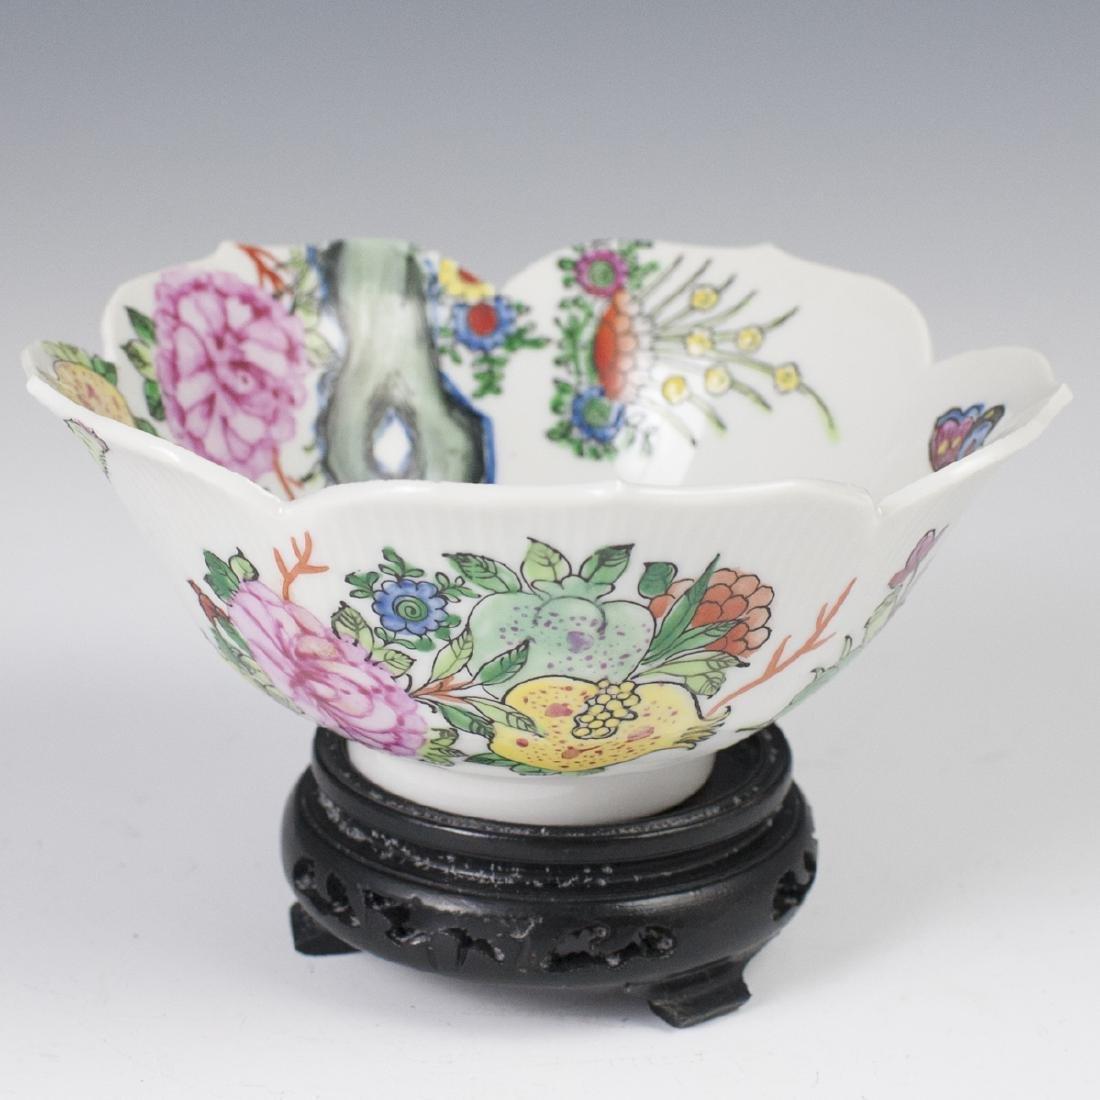 Oriental Objects D'Art Porcelain Bowl